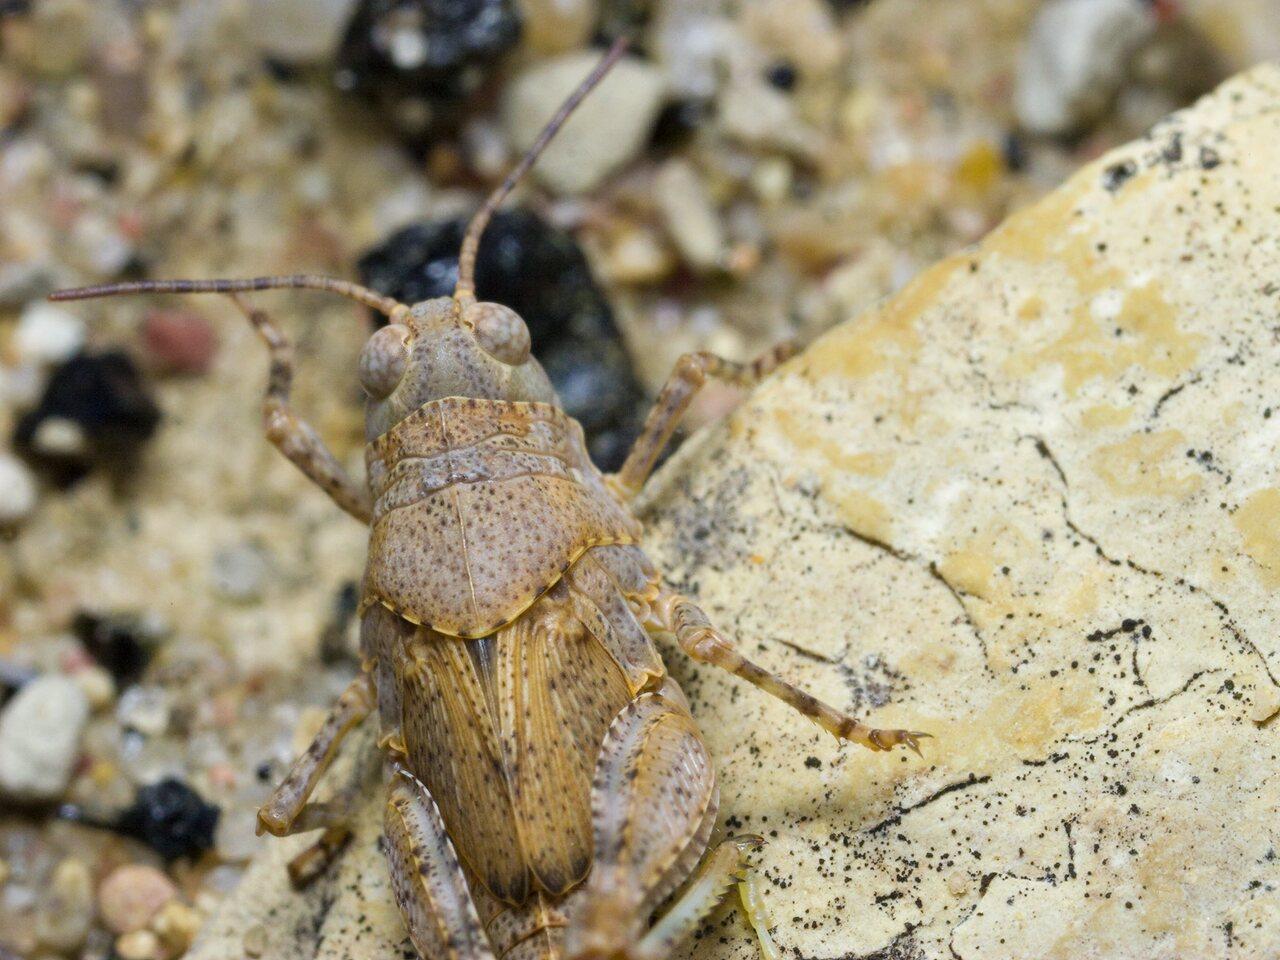 Oedipoda-caerulescens-0713.jpg